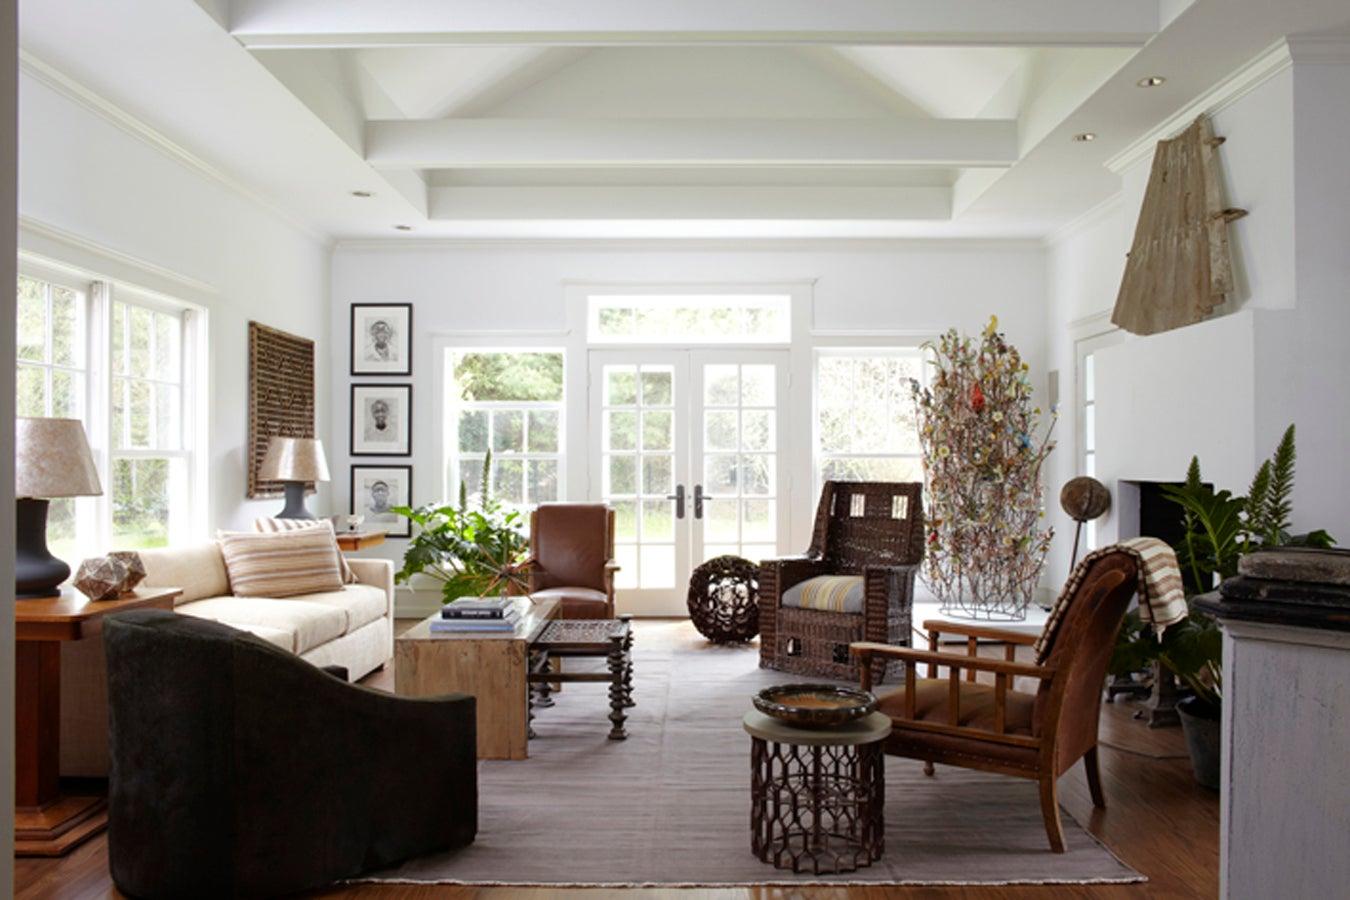 stunning east hampton living room design | Living Room by Huniford Design Studio on 1stdibs